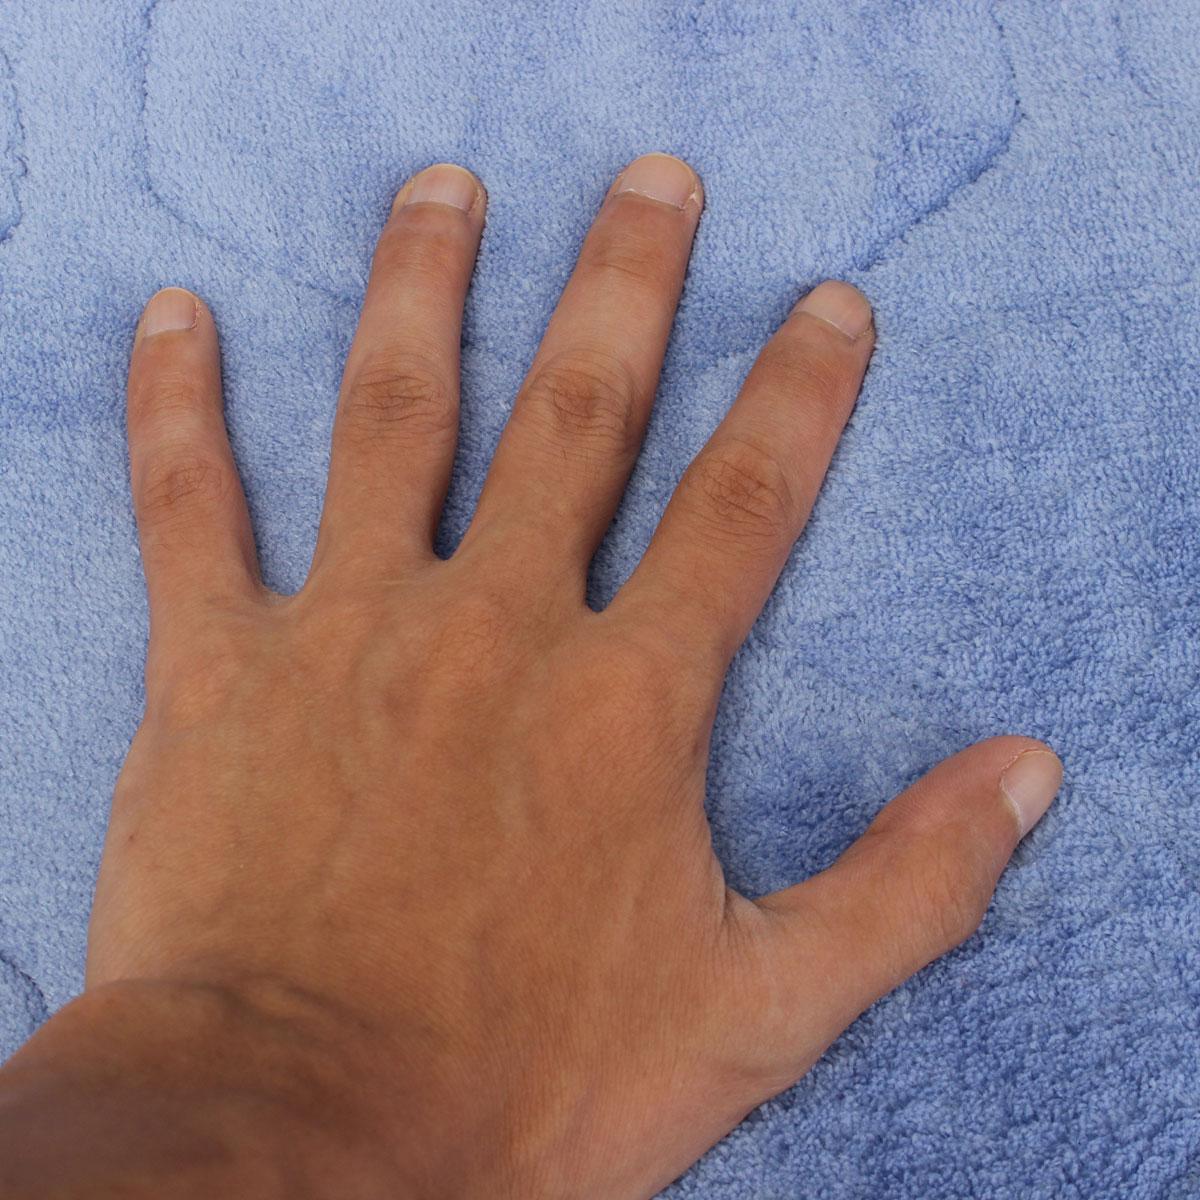 40 X 60cm Absorbent Soft Memory Foam Mat Bath Bathroom Rug